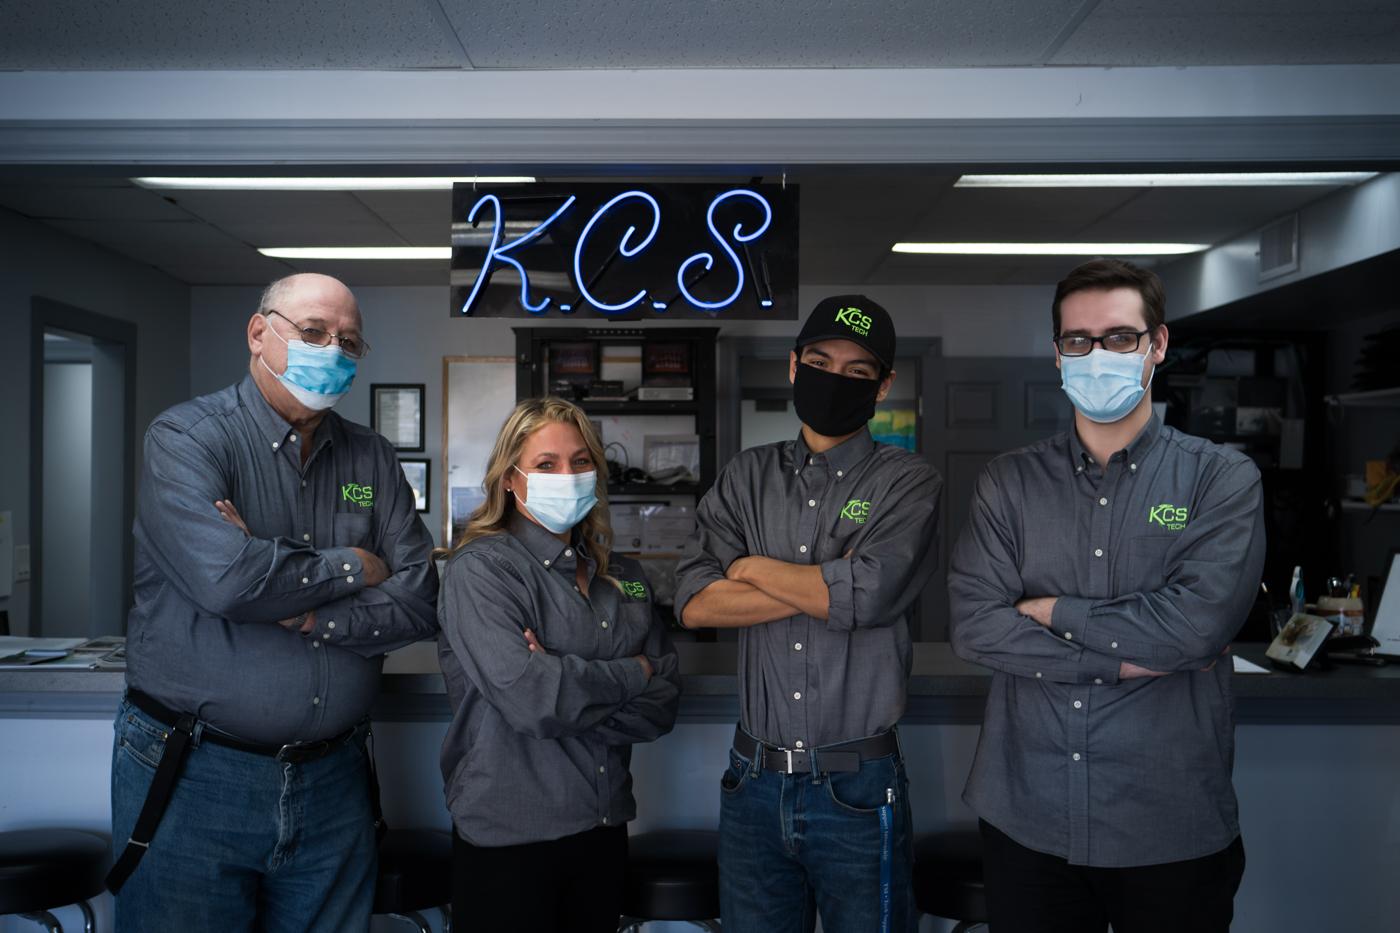 KCS storefront crew wearing masks